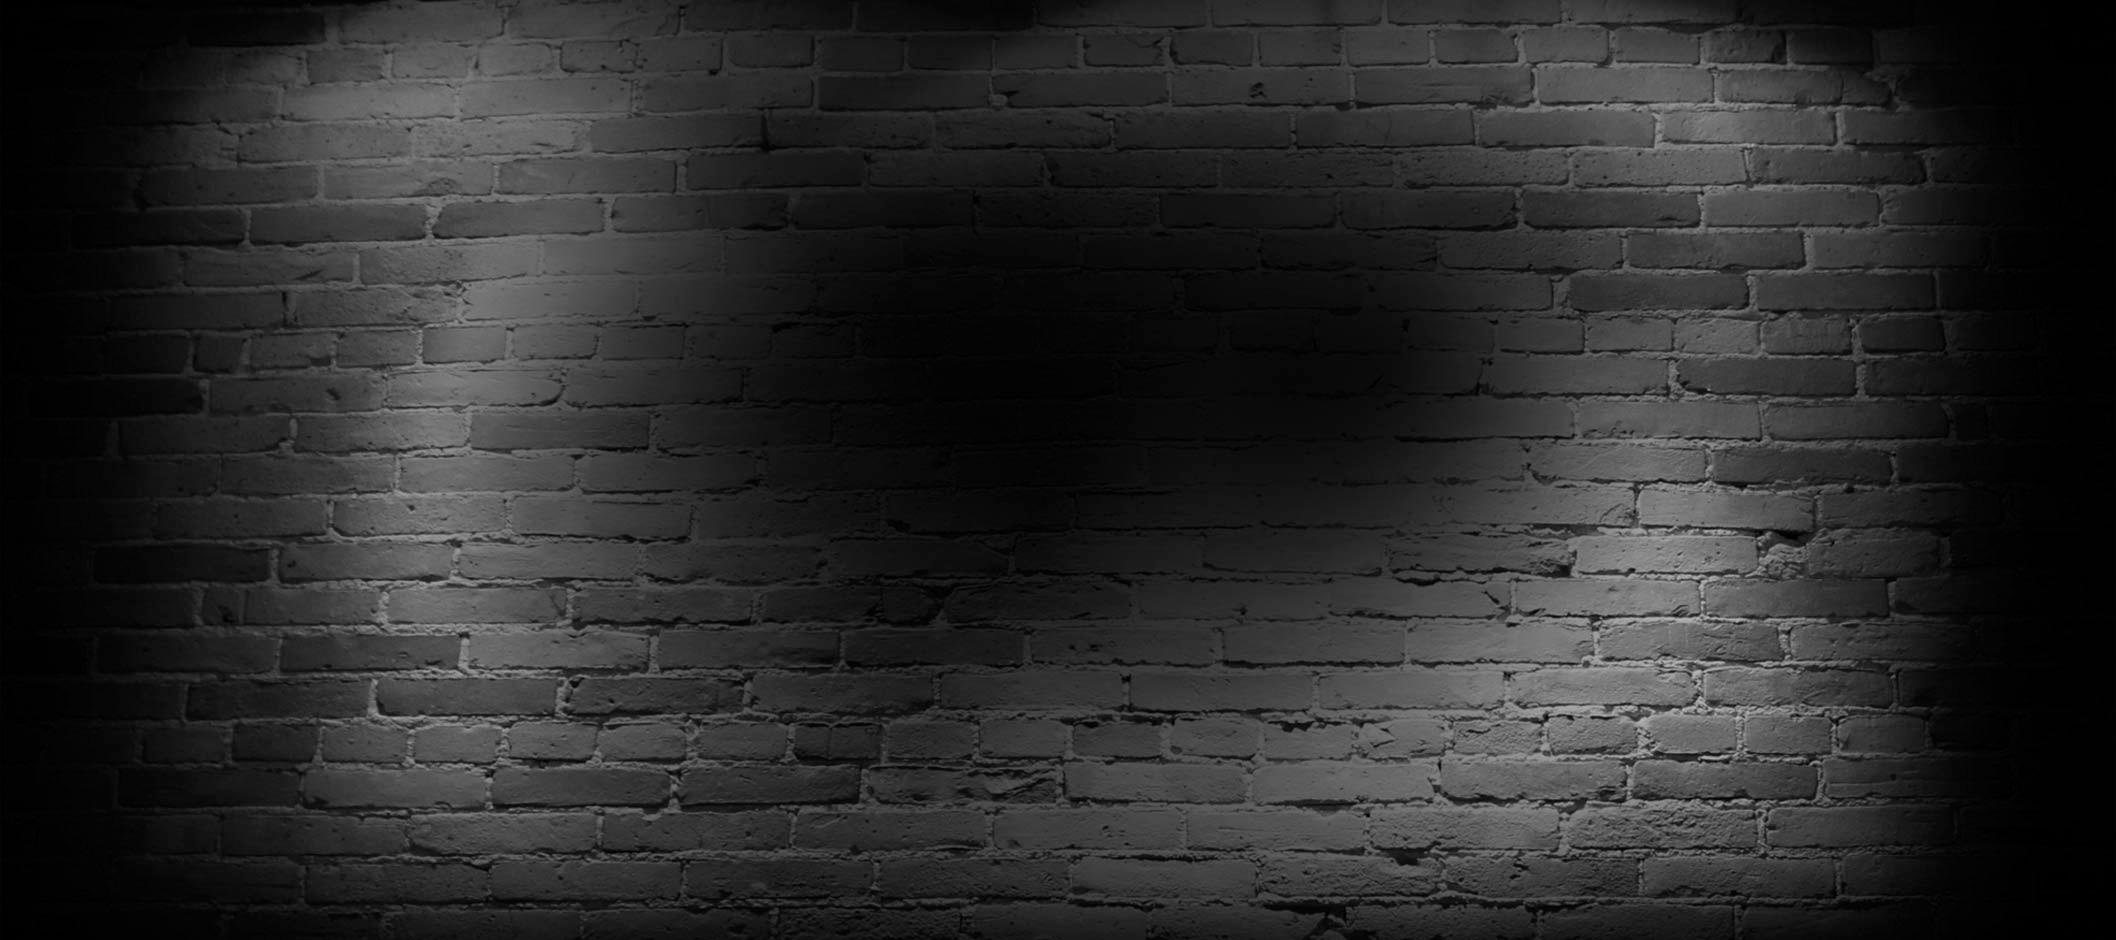 Videography-background.jpg